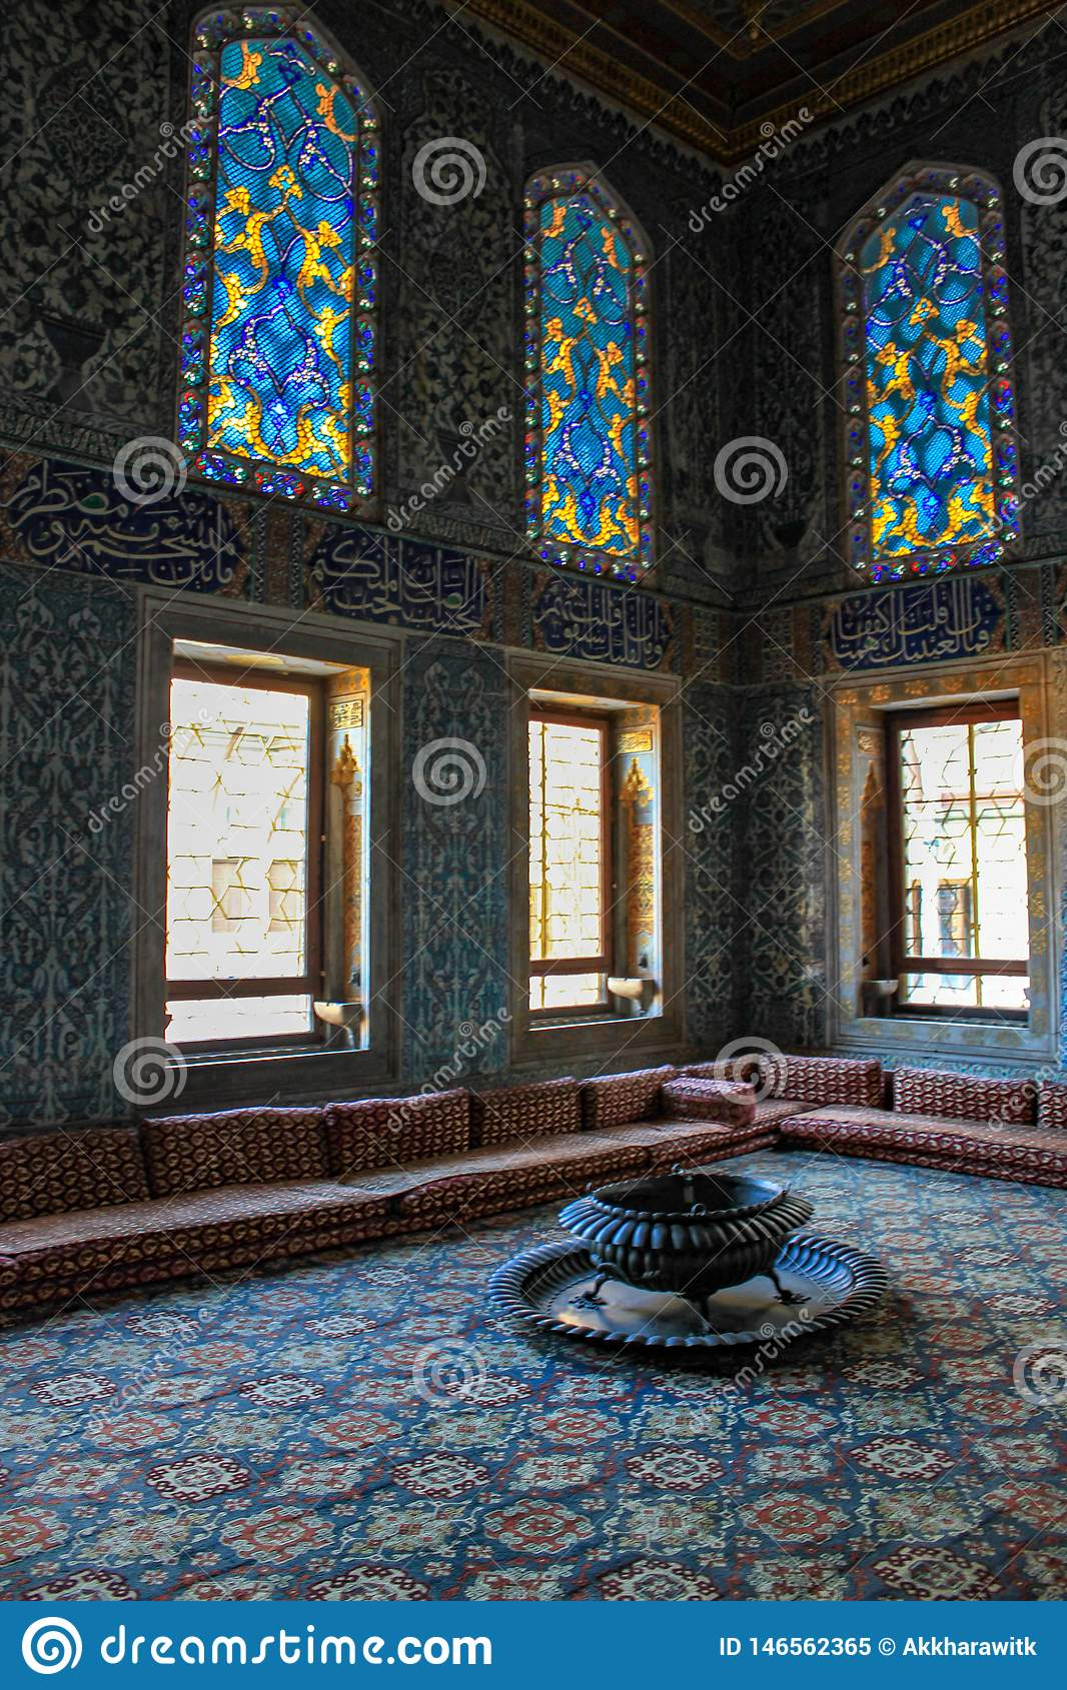 Beautiful interior with mosaic tiles decor